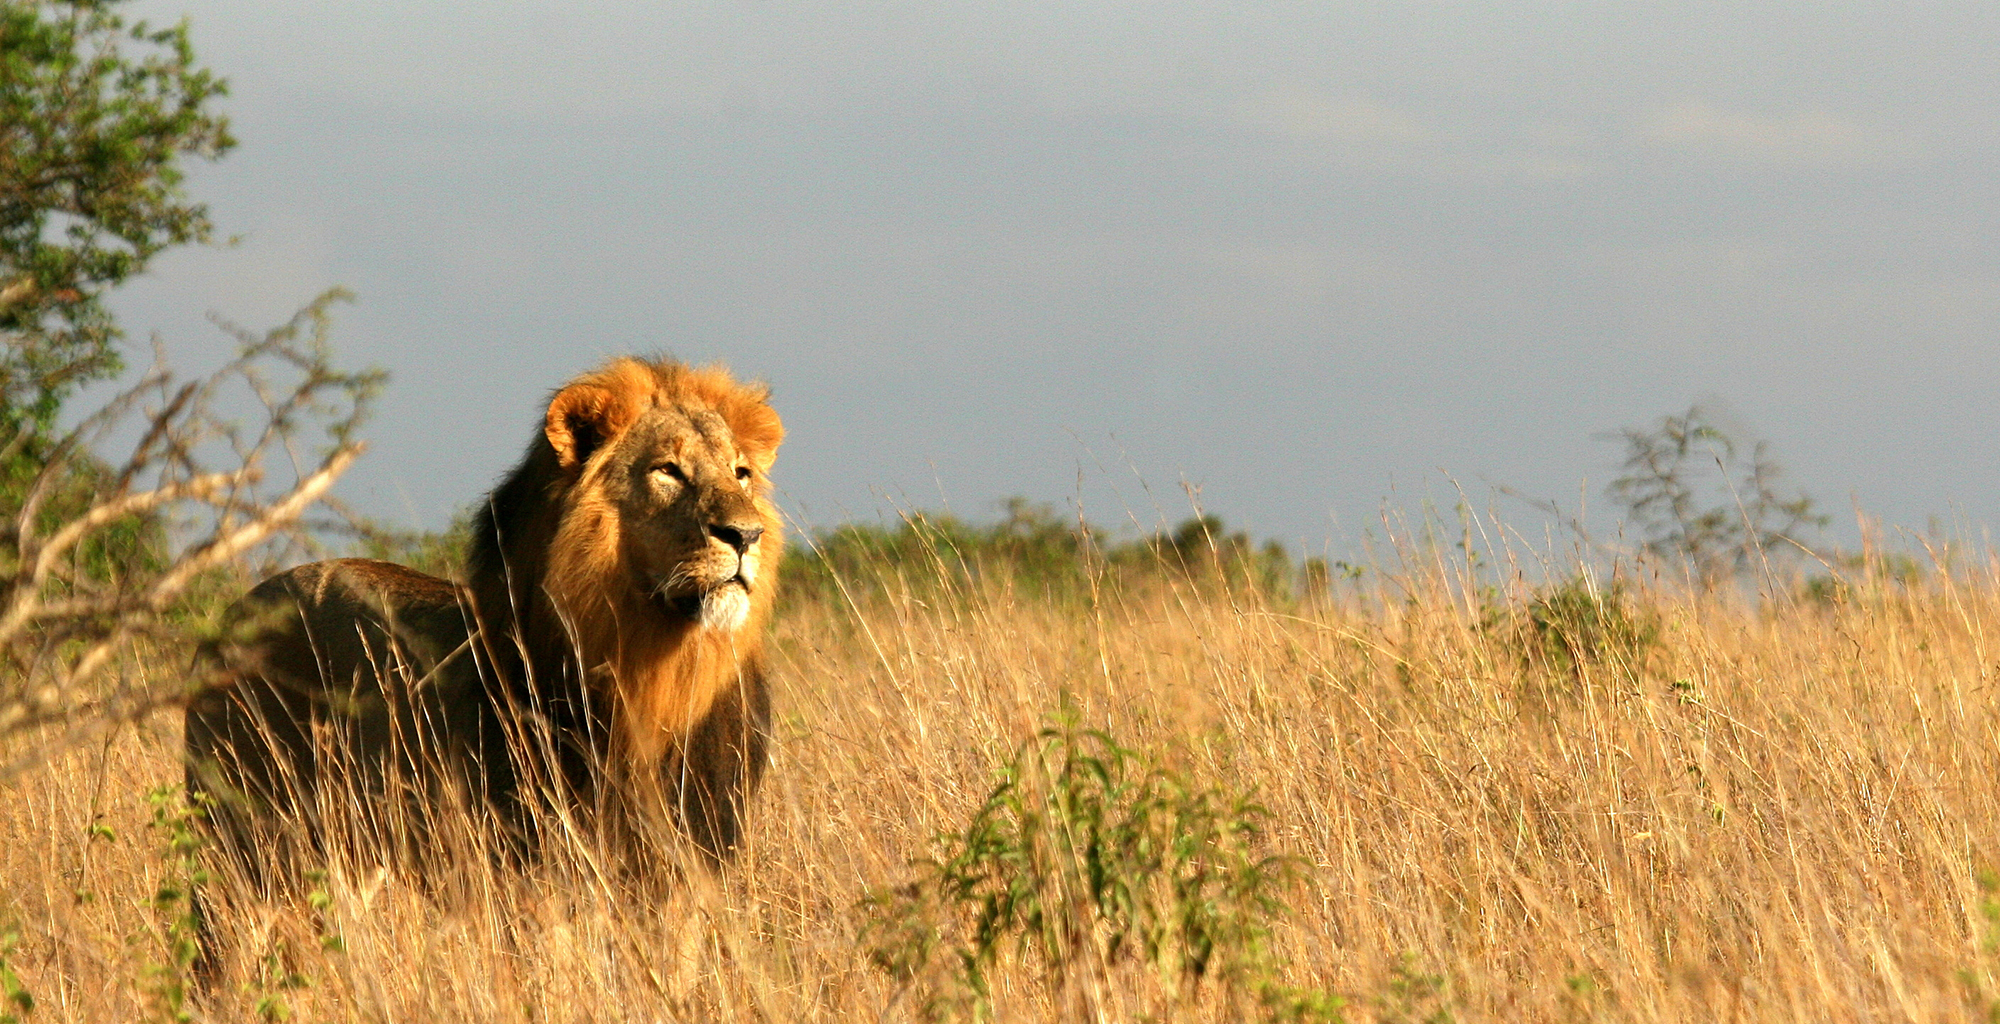 Kenya-Emakoko-Lion